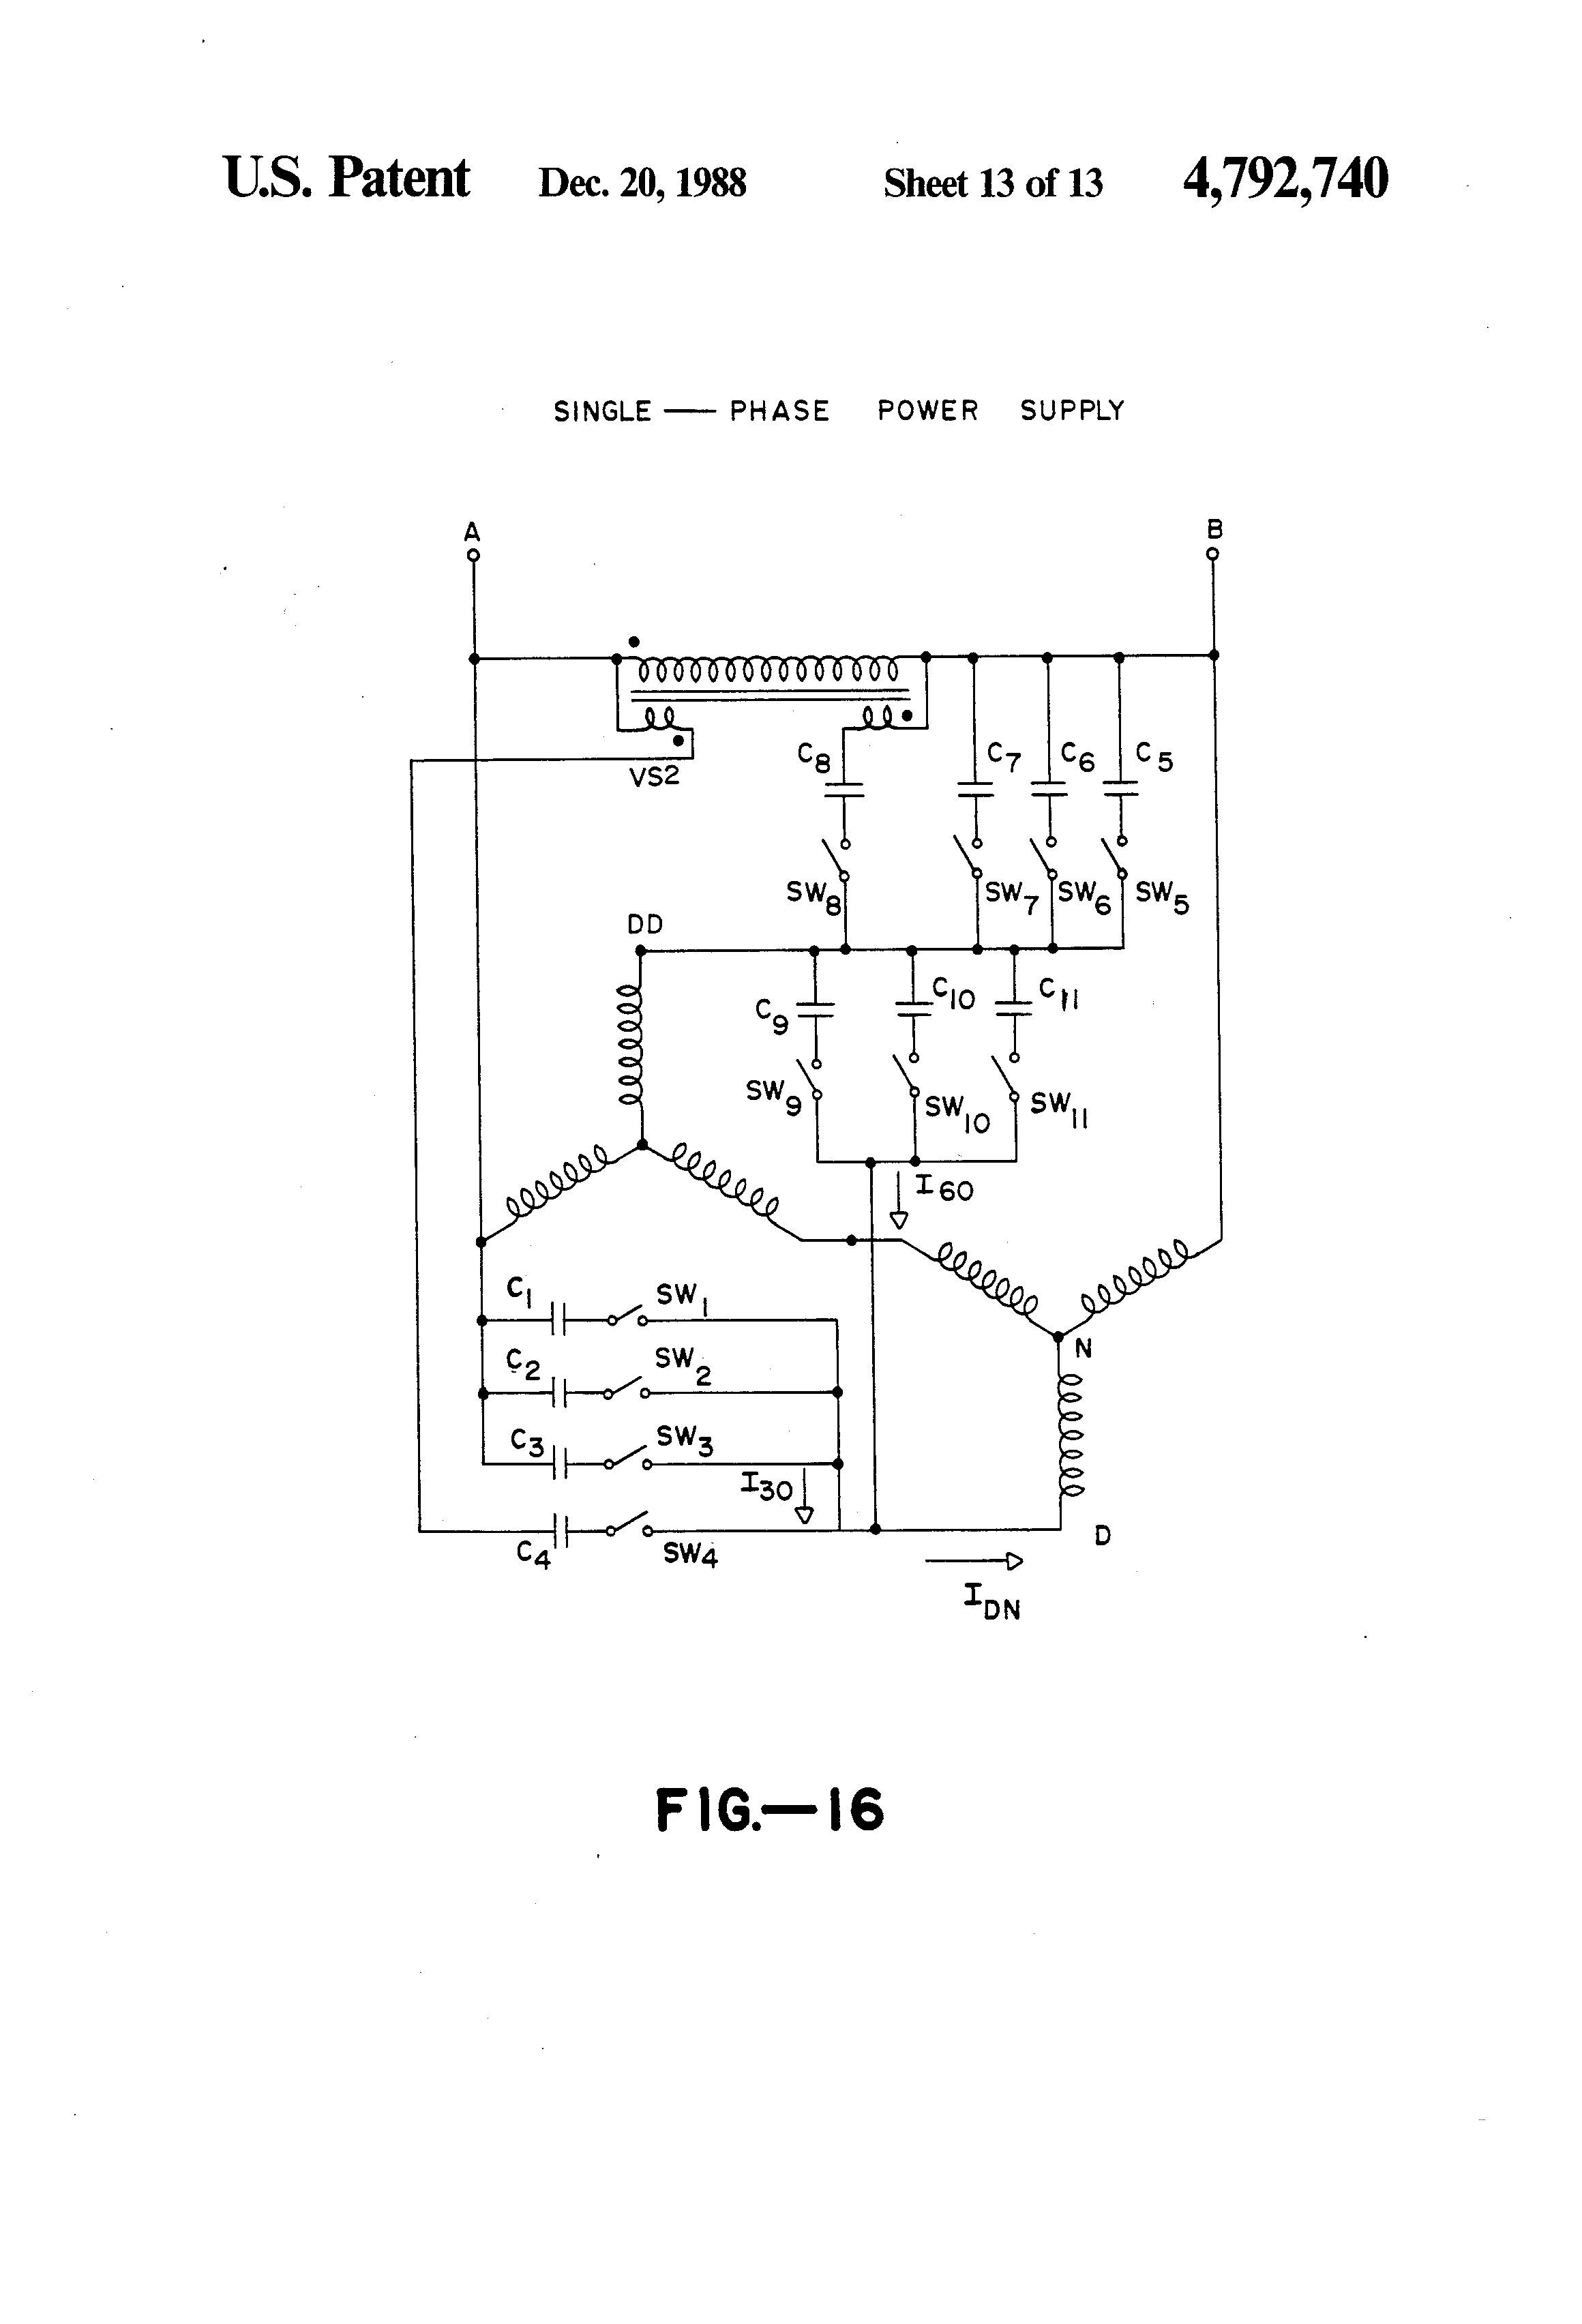 Ronk Roto Phase Wiring Diagram   Wiring Diagram - Rotary Phase Converter Wiring Diagram